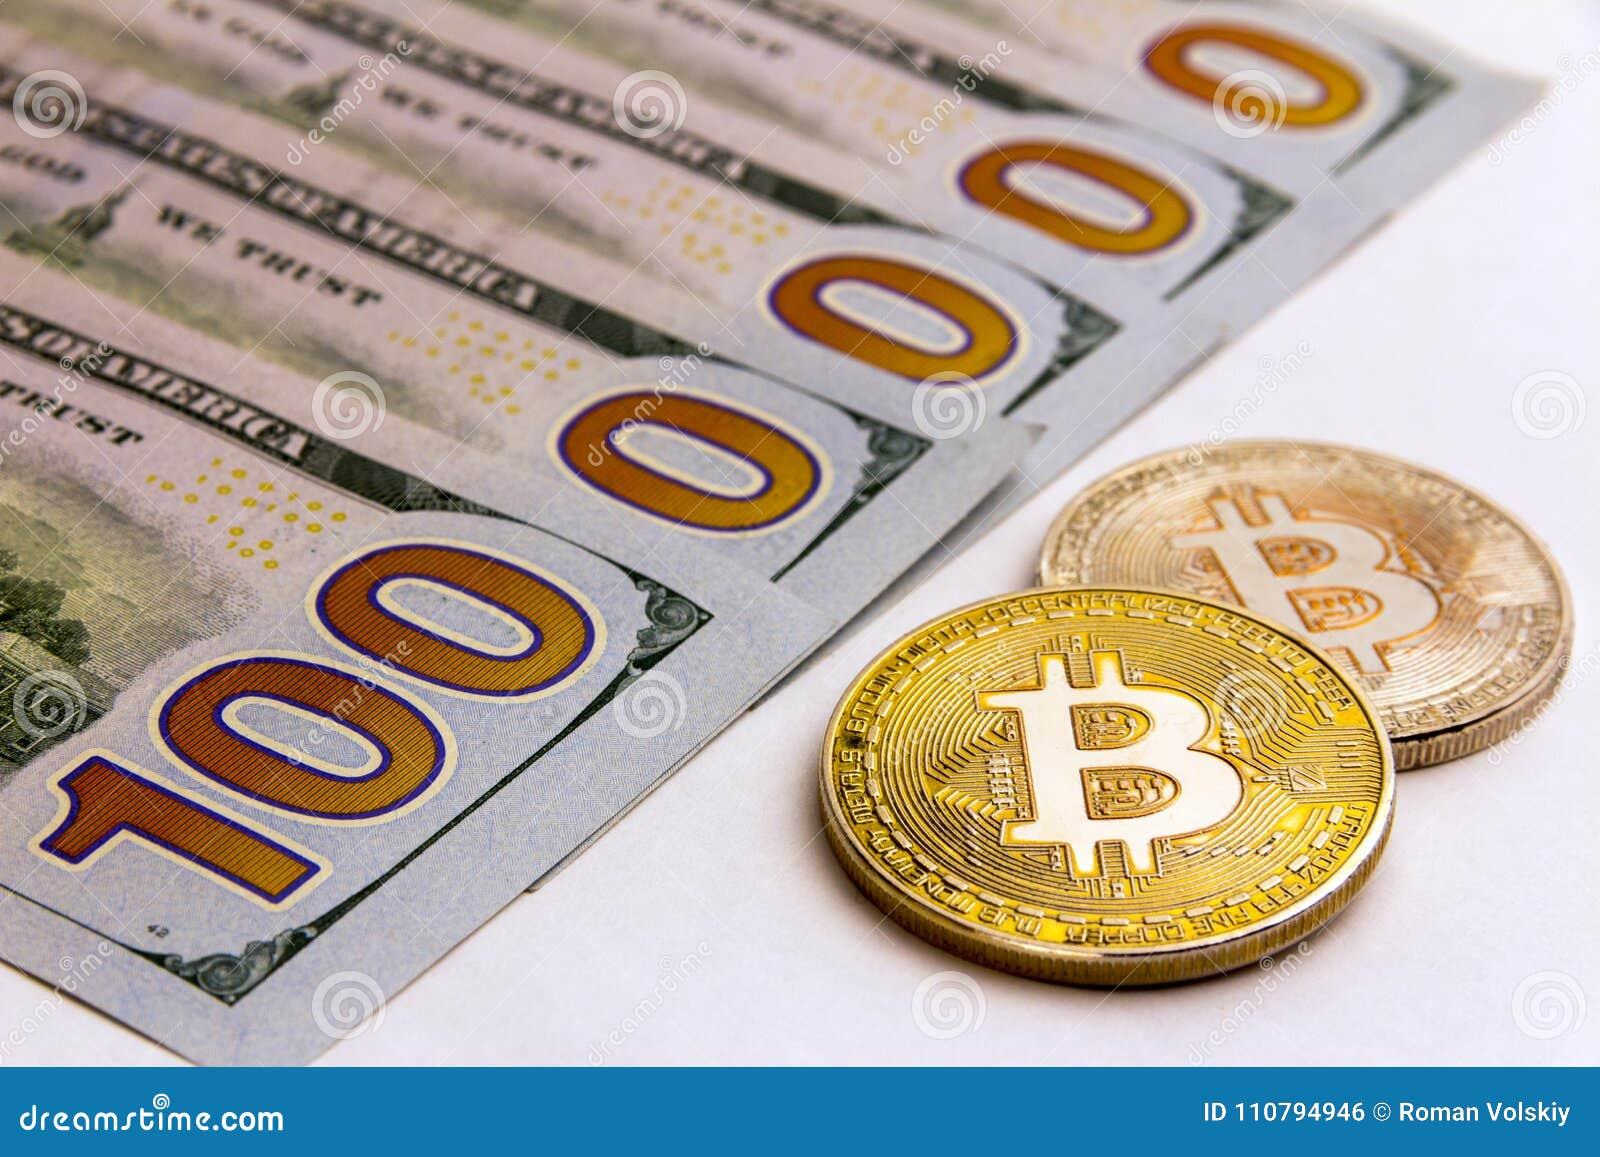 asic bitcoin miner china